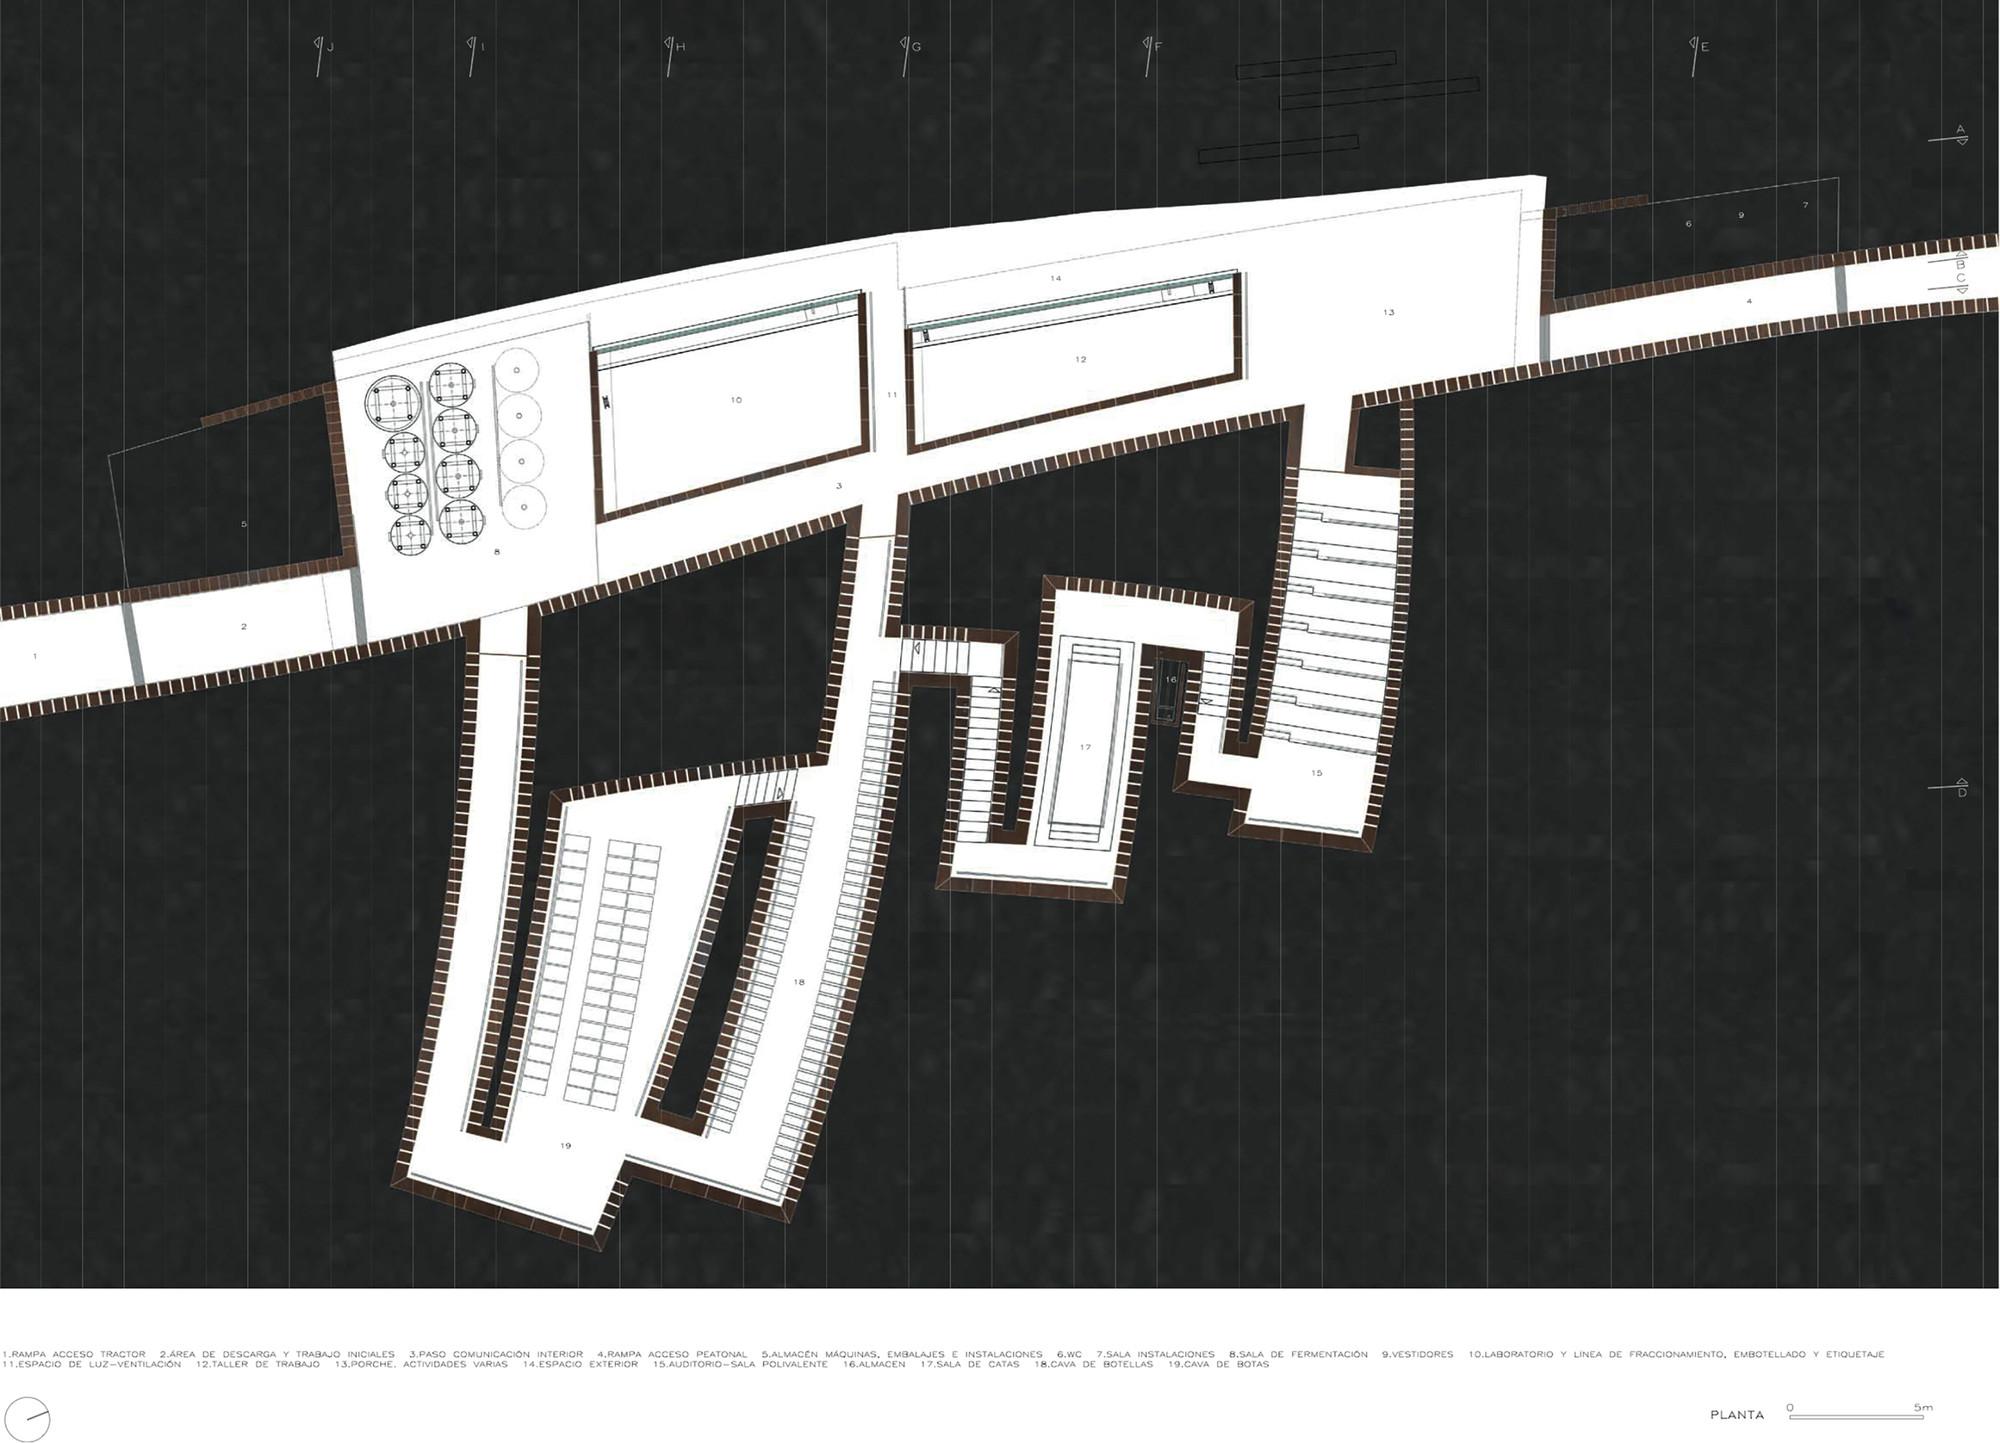 Gallery Floor Plans Gallery Of Bell Lloc Winery Rcr Arquitectes 27